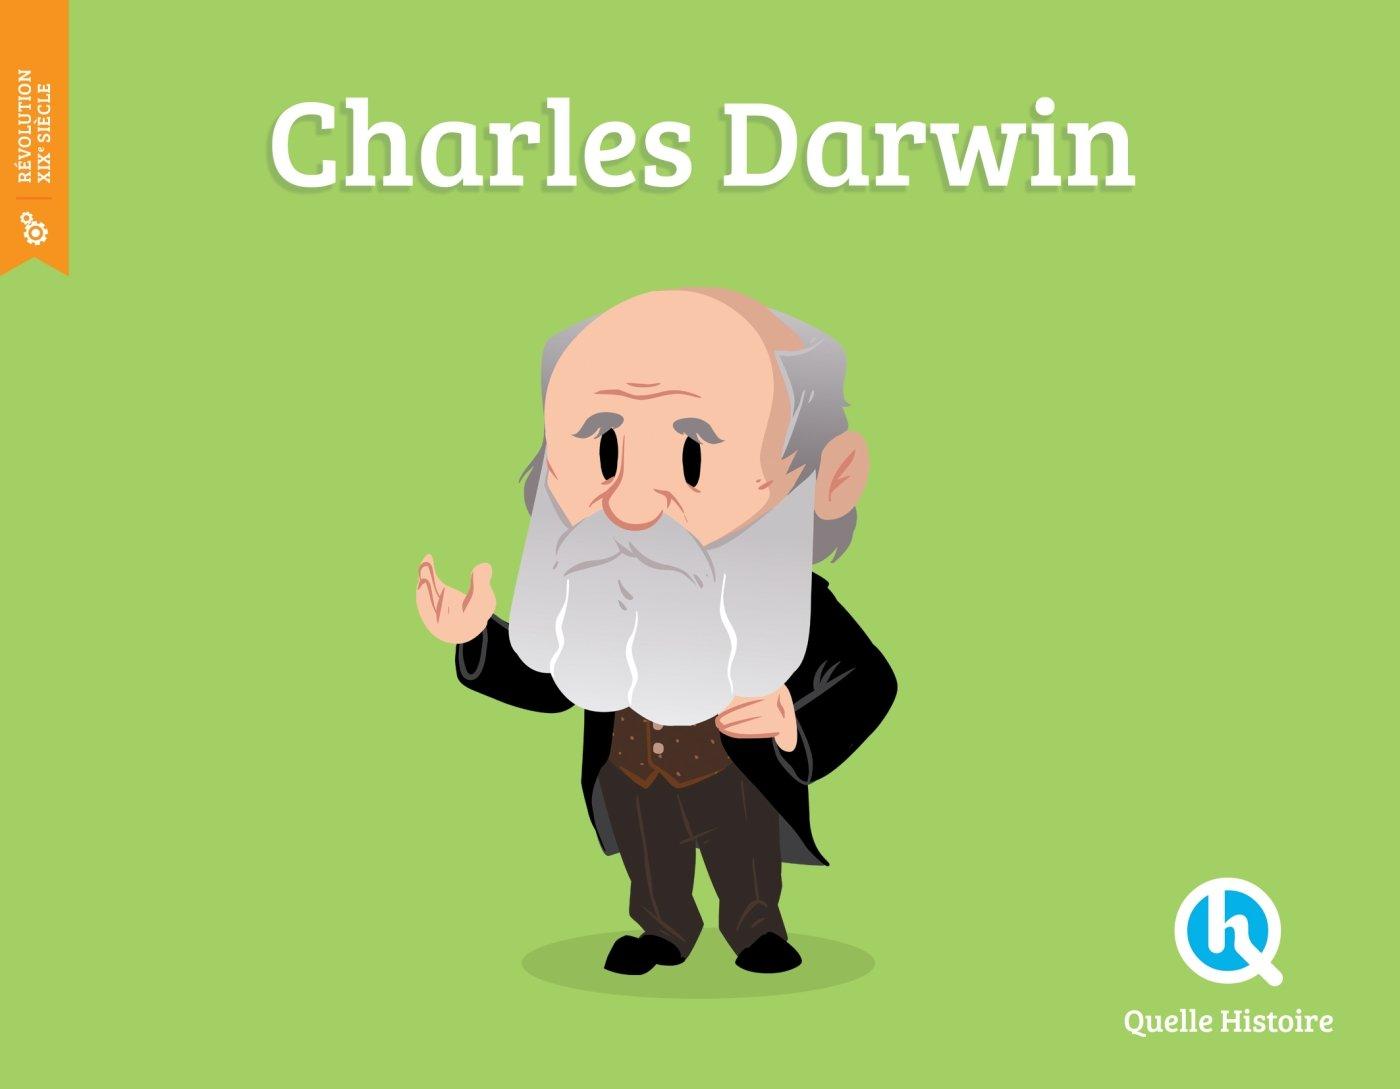 Charles Darwin Album – 14 mars 2018 Clémentine V. Baron Bruno Wennagel Mathieu Ferret Quelle Histoire Editions